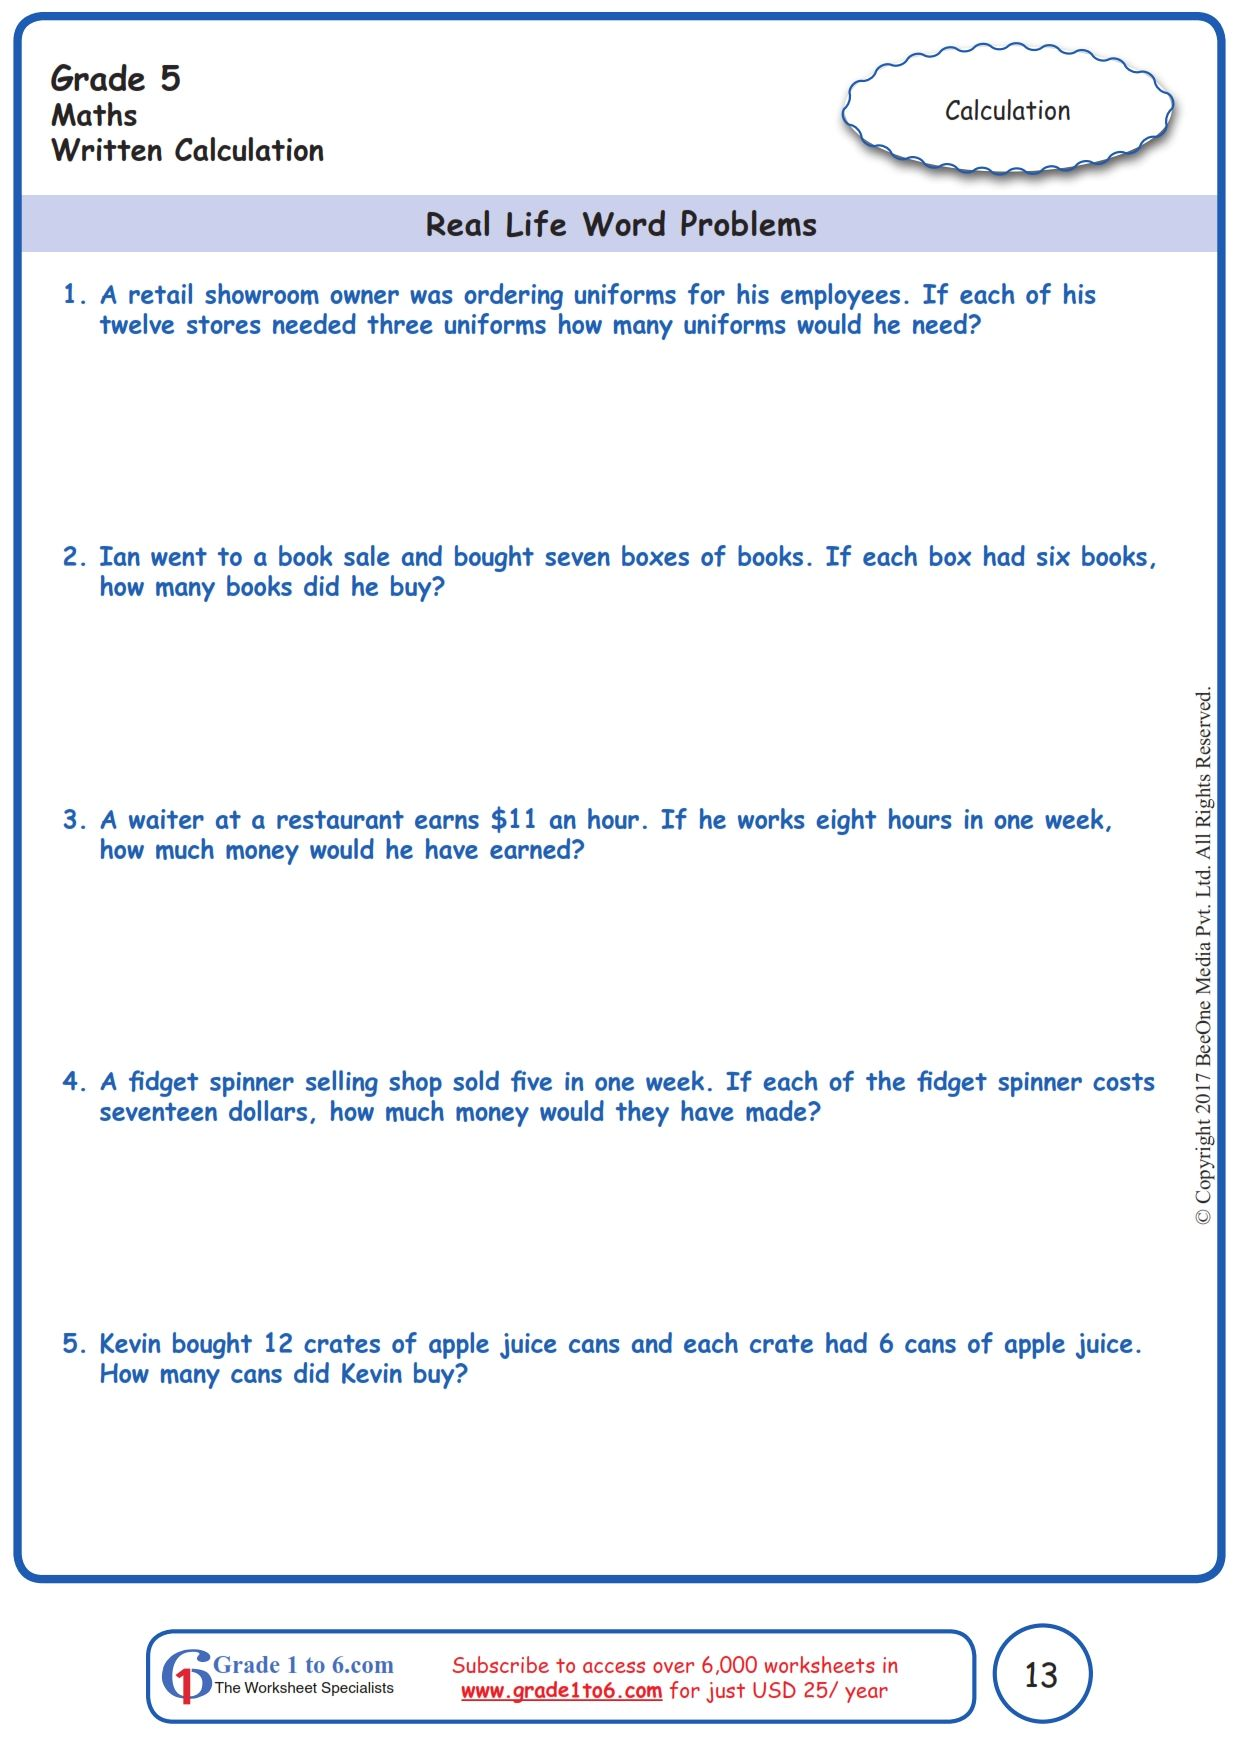 hight resolution of Worksheet Grade 5 Math Real Life Word Problems   Basic math worksheets